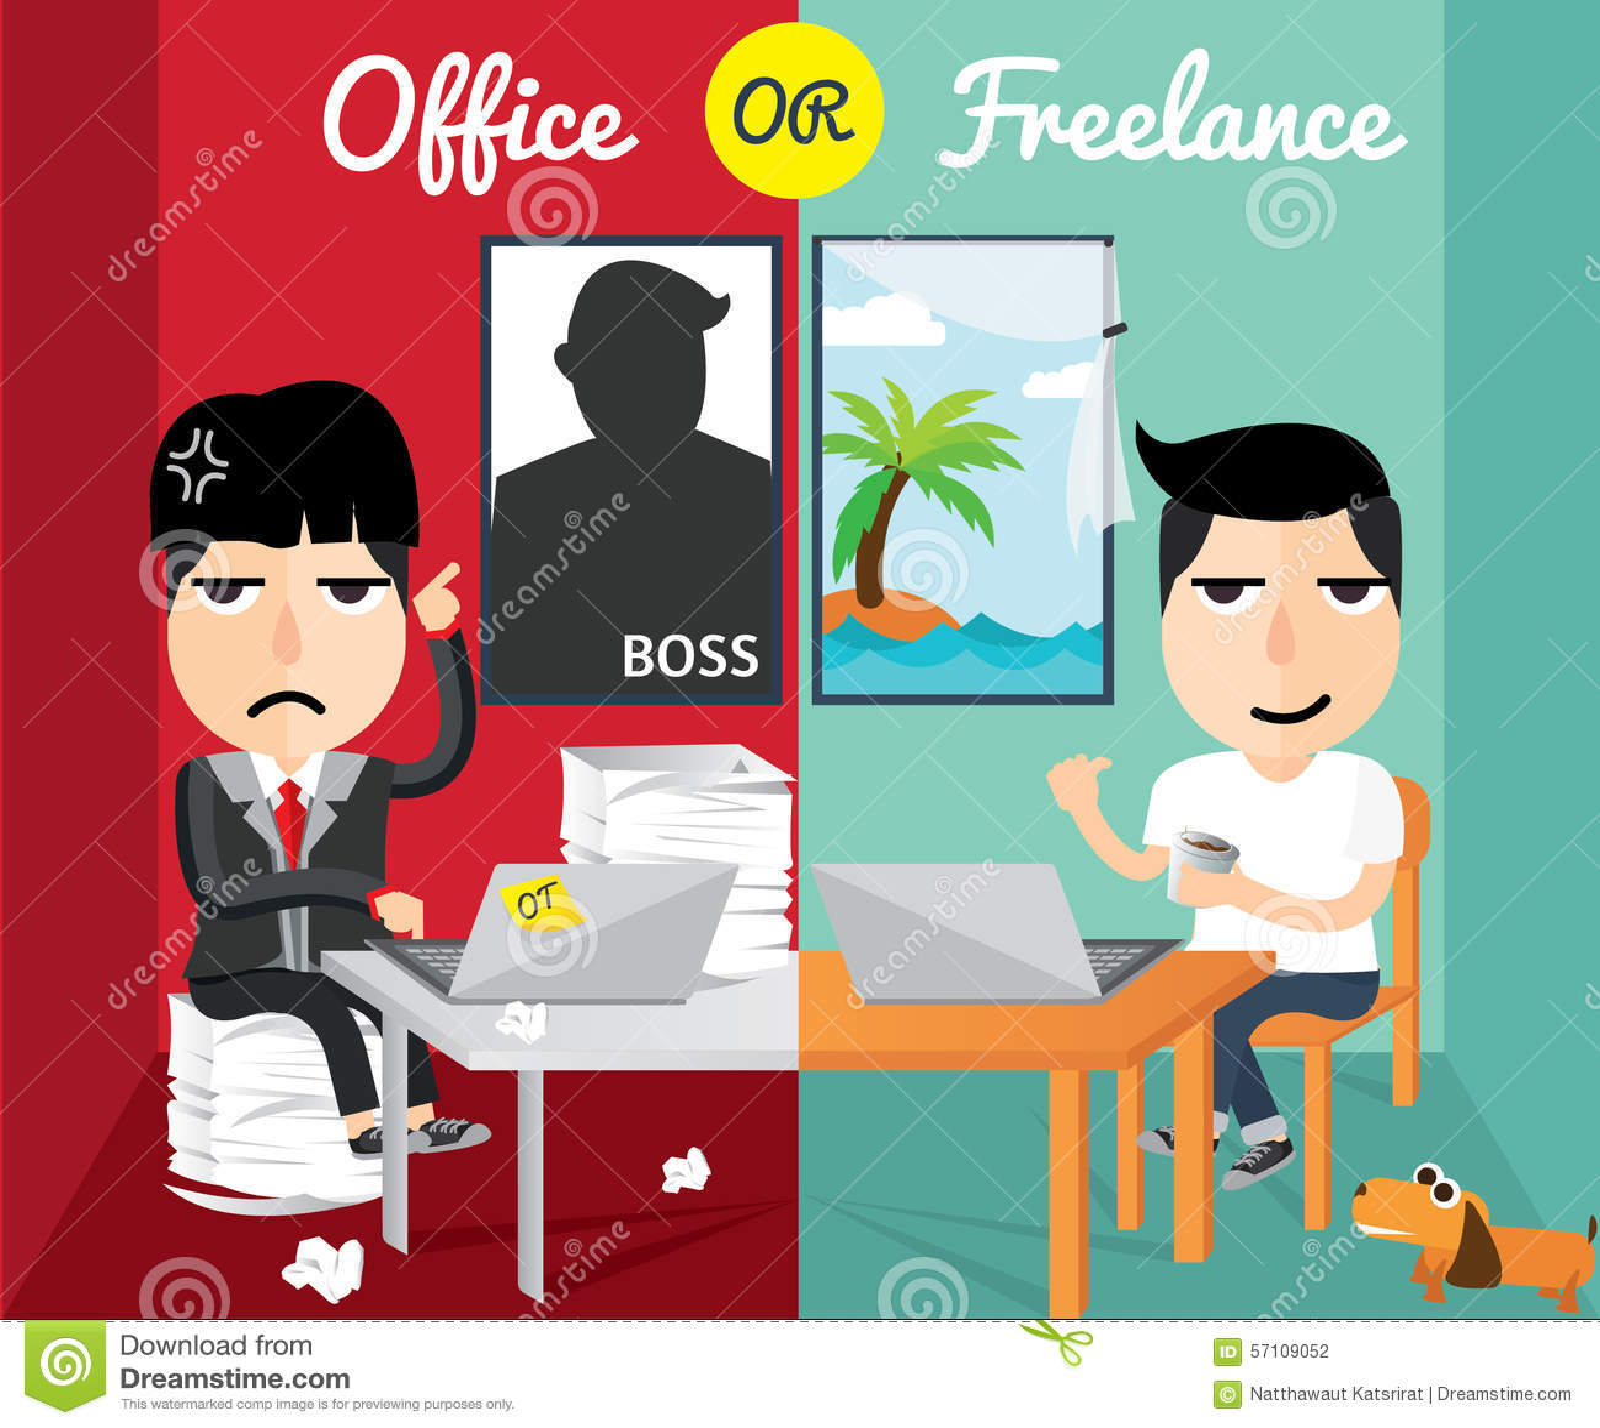 Office Or Freelance, Flat Design,character Design Stock Vector ...